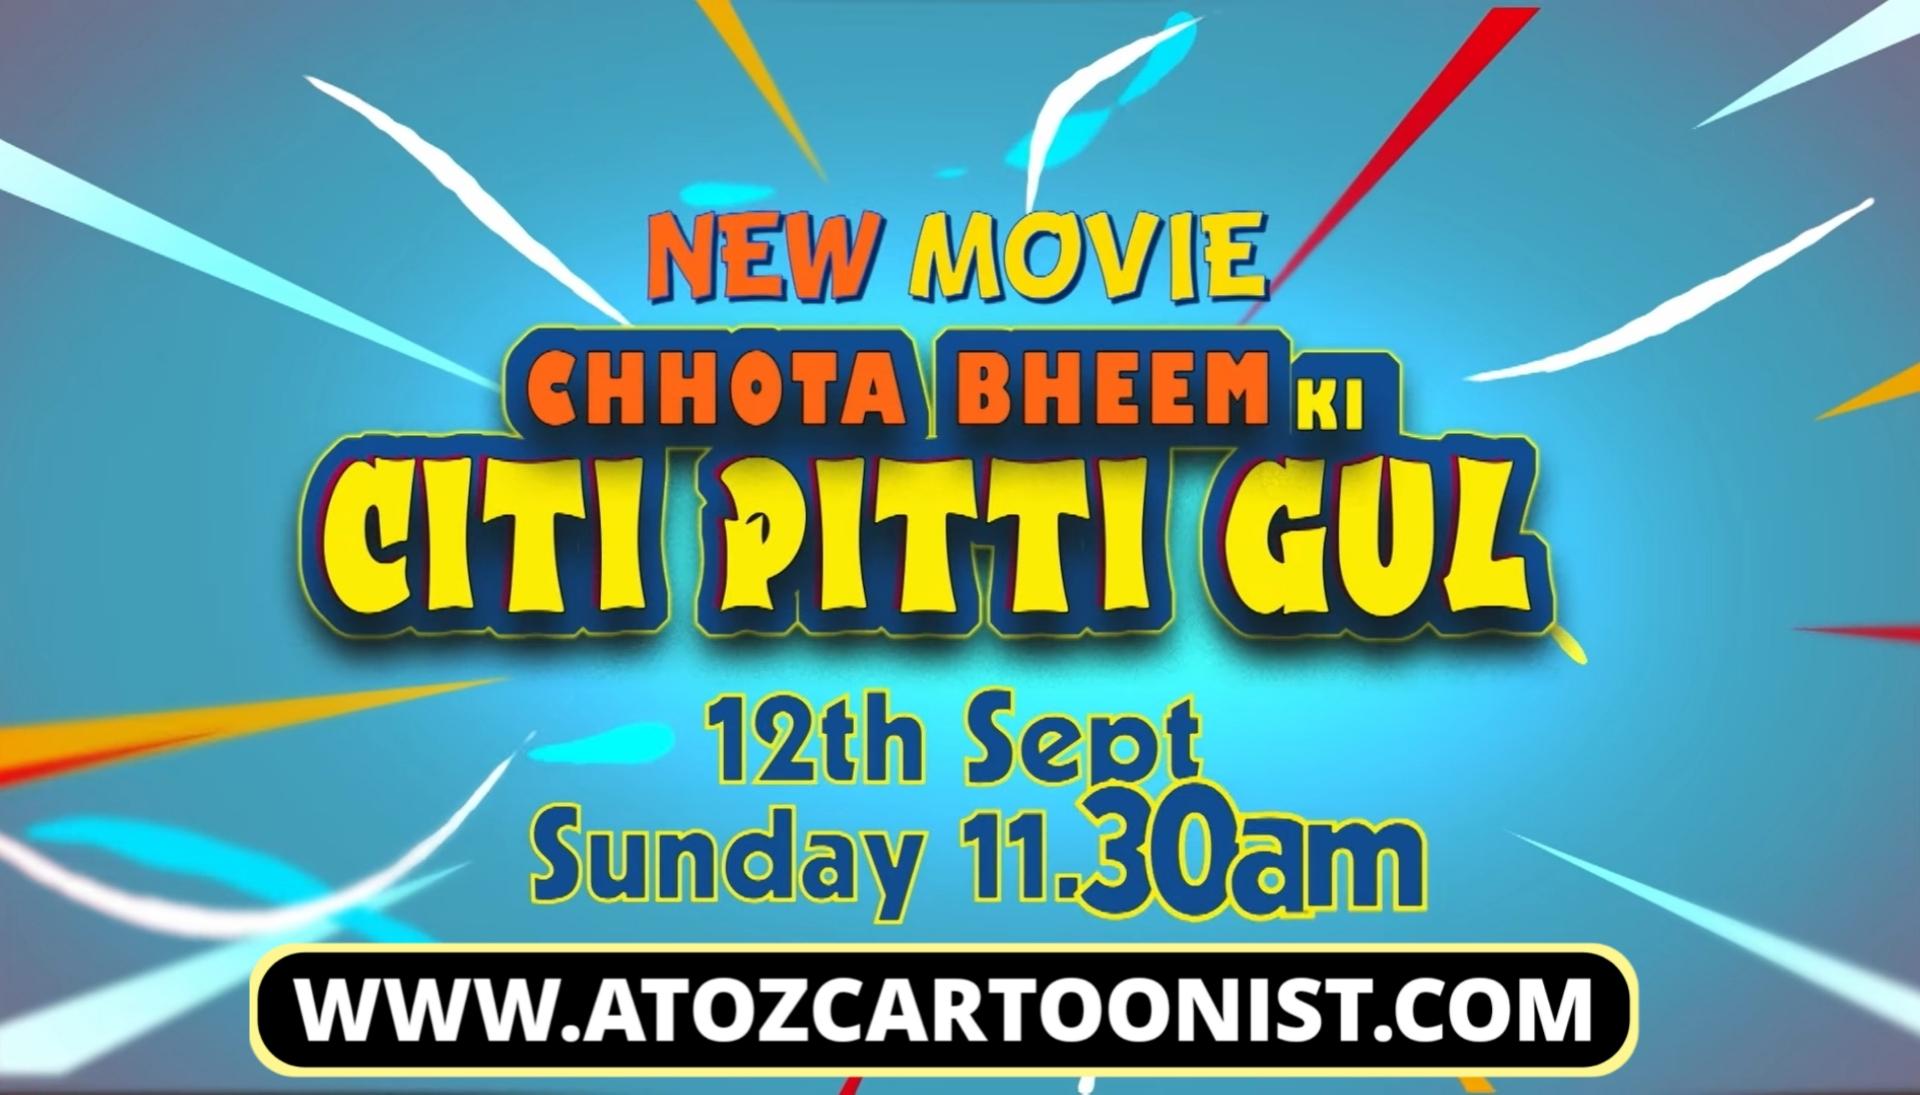 CHHOTA BHEEM KI CITTI PITTI GUL FULL MOVIE IN HINDI DOWNLOAD (480P & 720P)